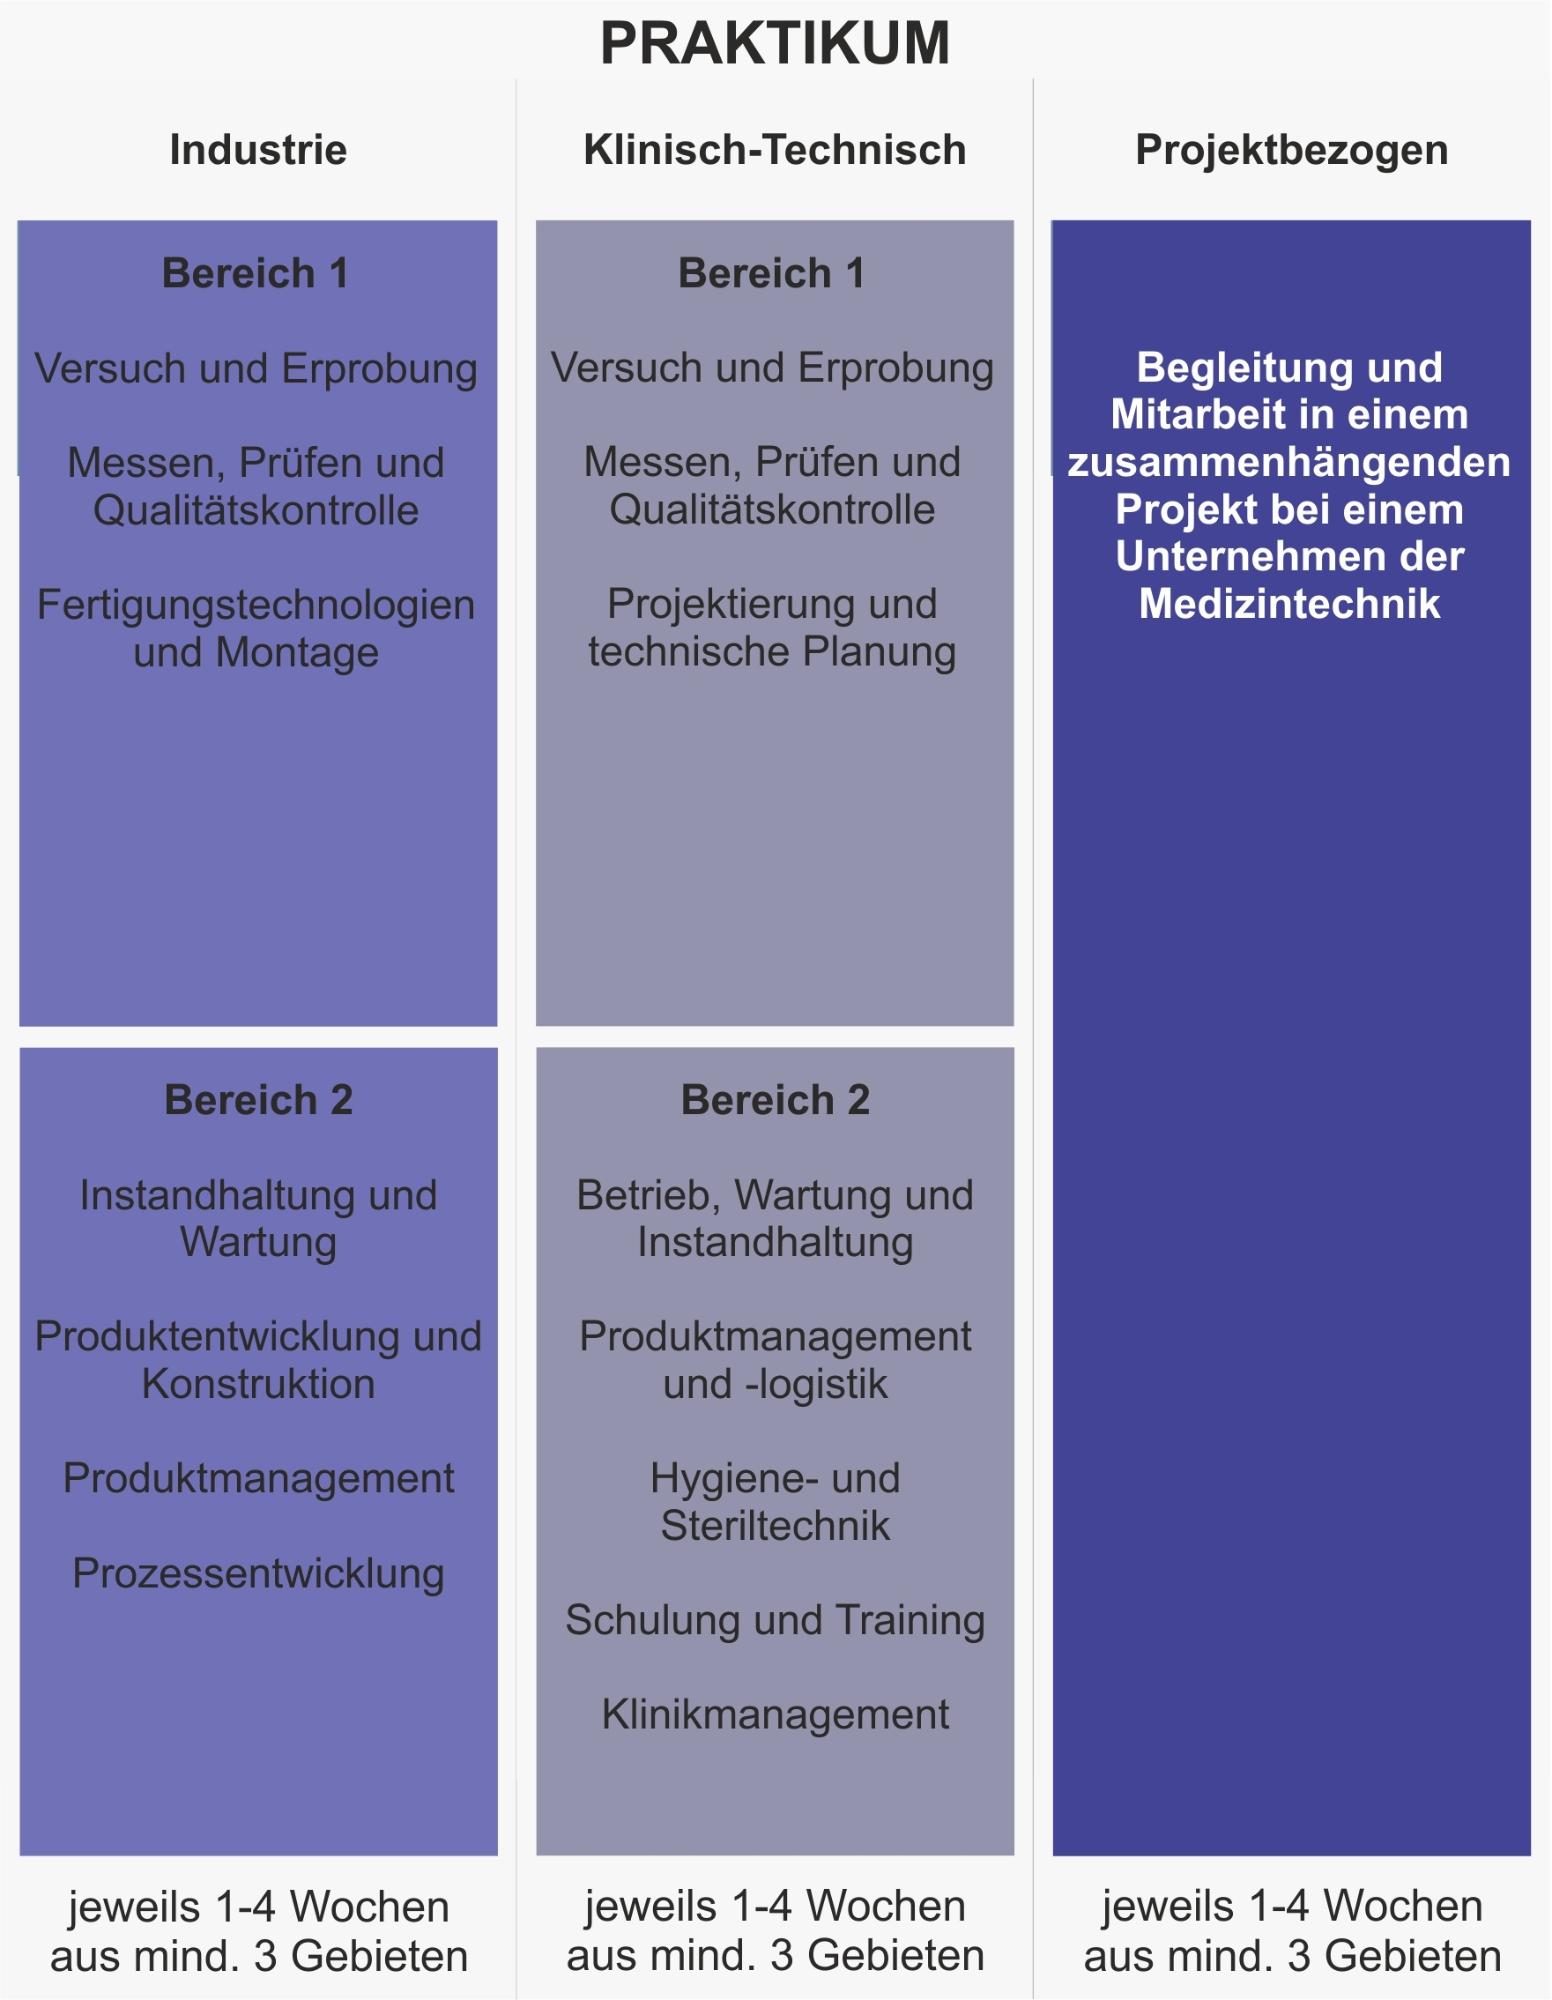 Grafik des industrie- oder klinisch-technischen Praktikums im Studiengang Medizintechnik M.Sc.